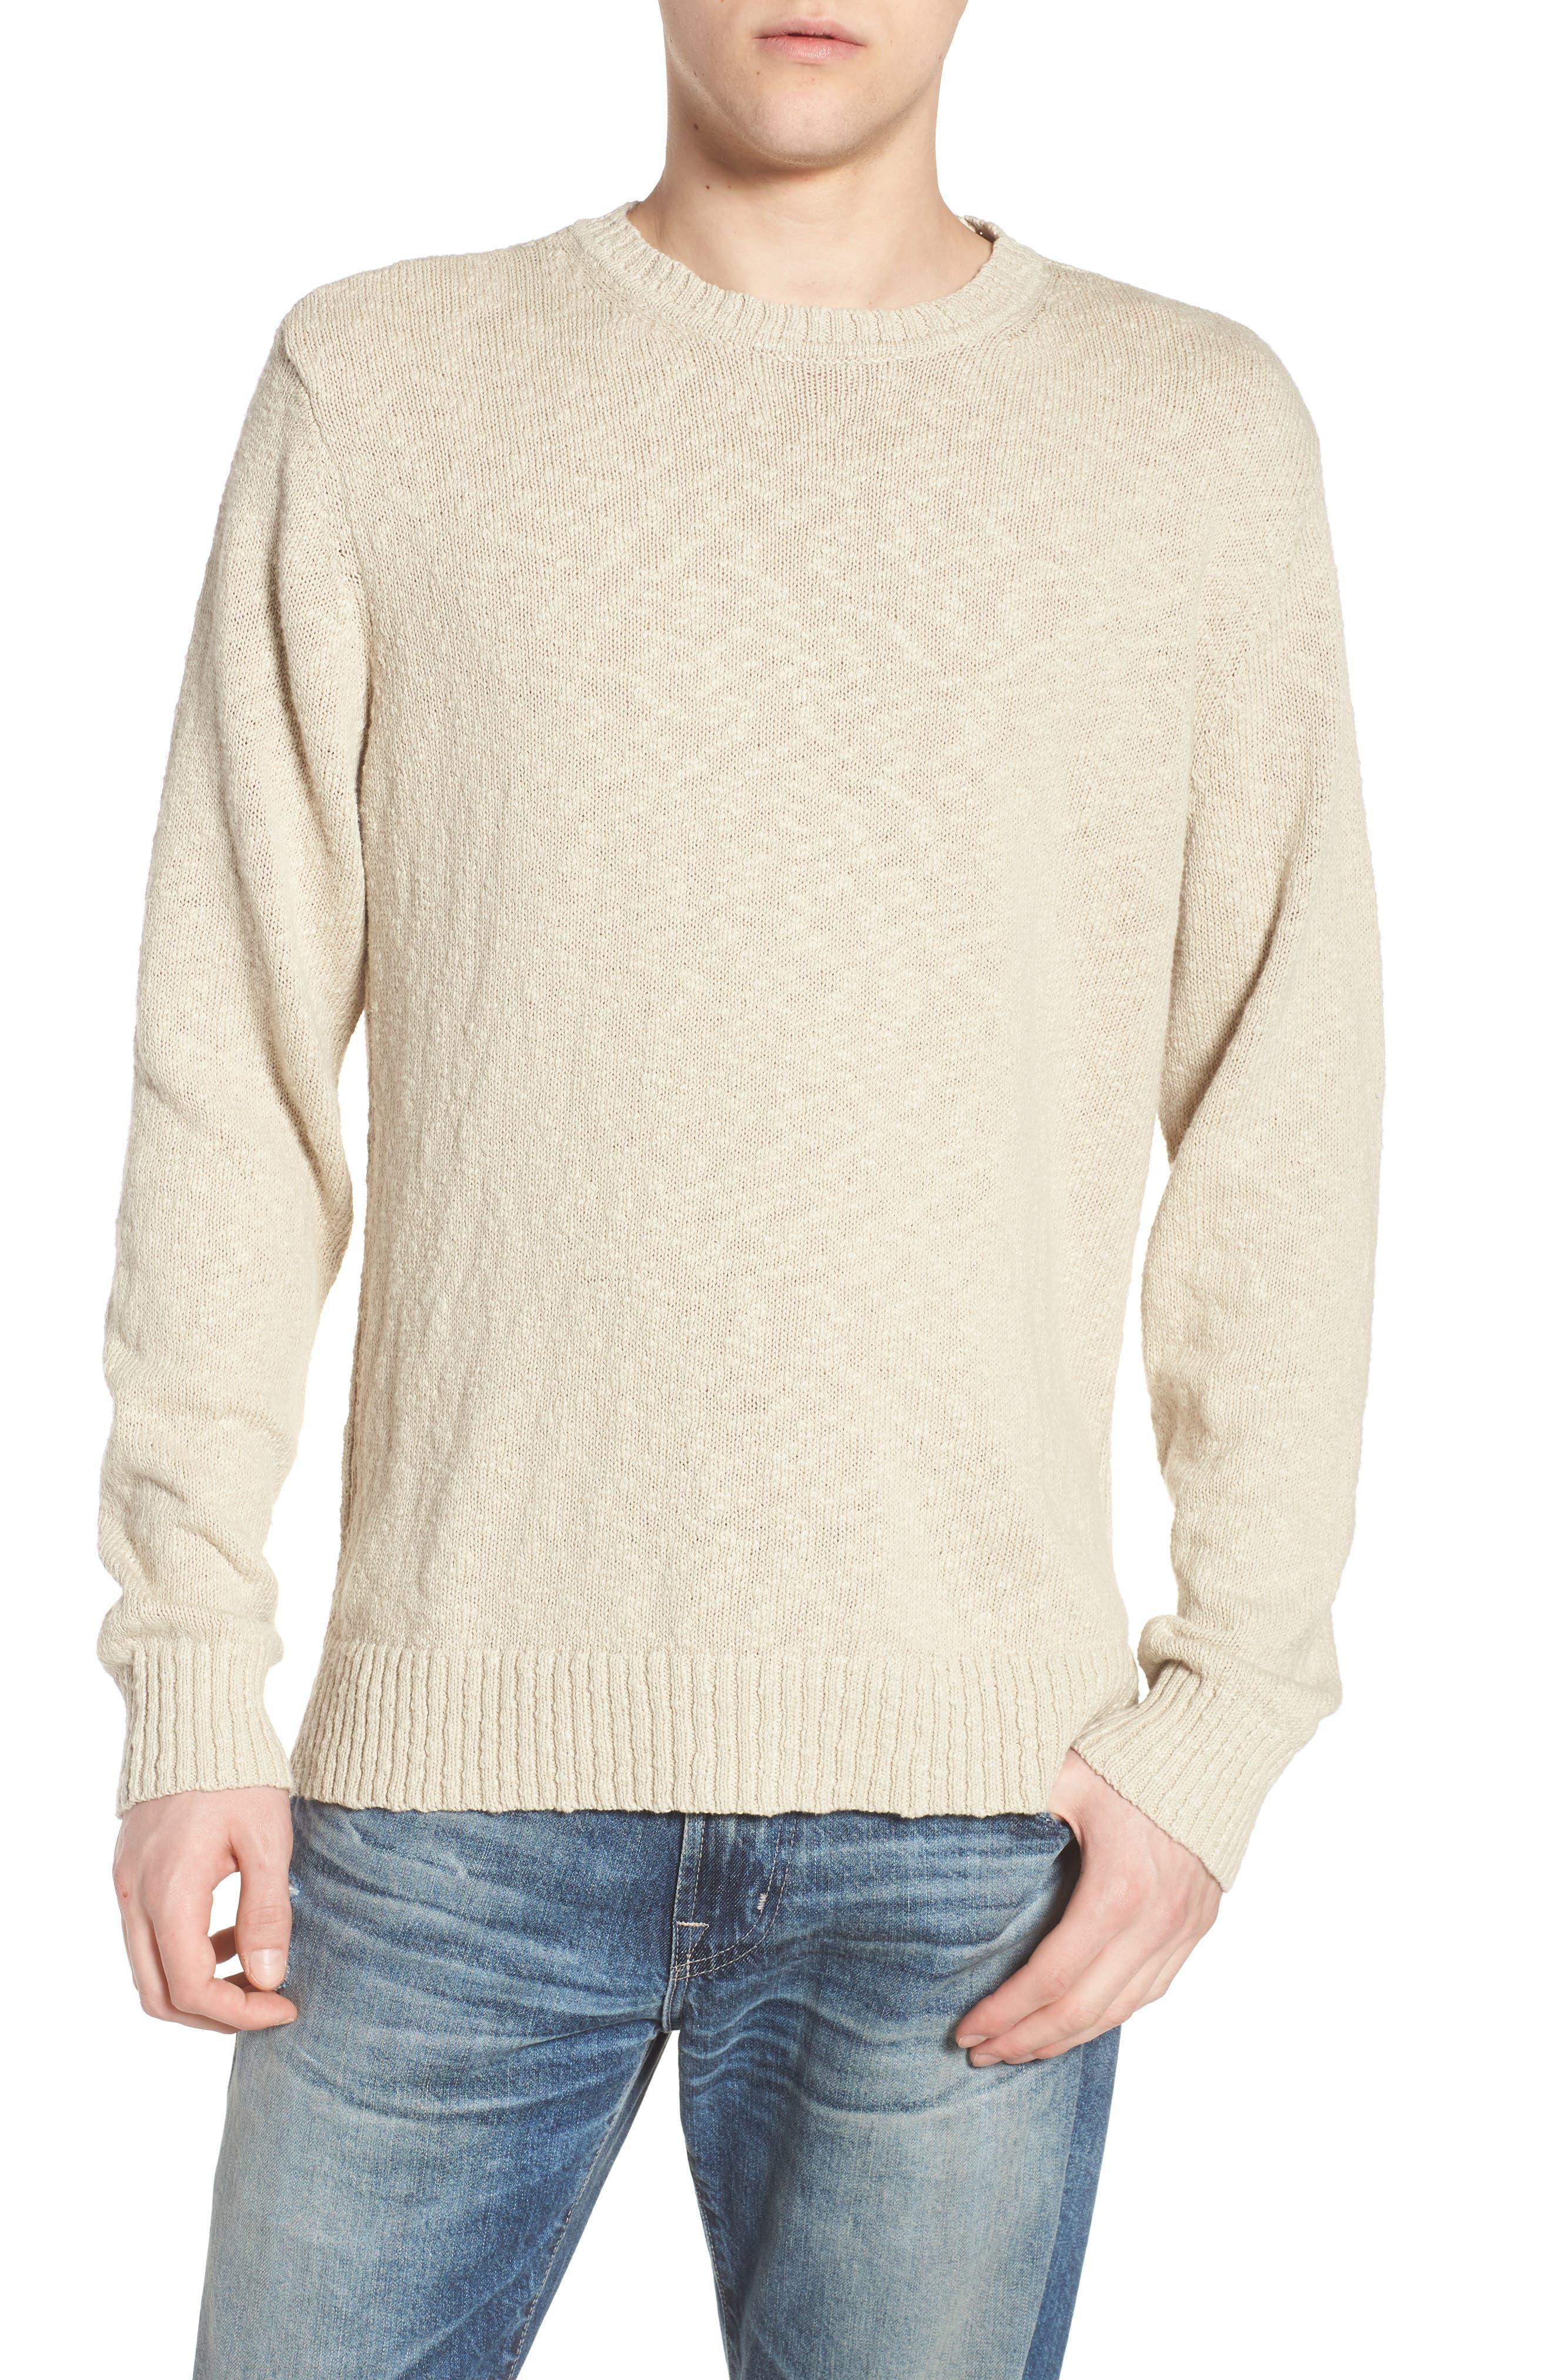 Deklyn Slim Fit Crew Sweater,                         Main,                         color, Mineral Veil